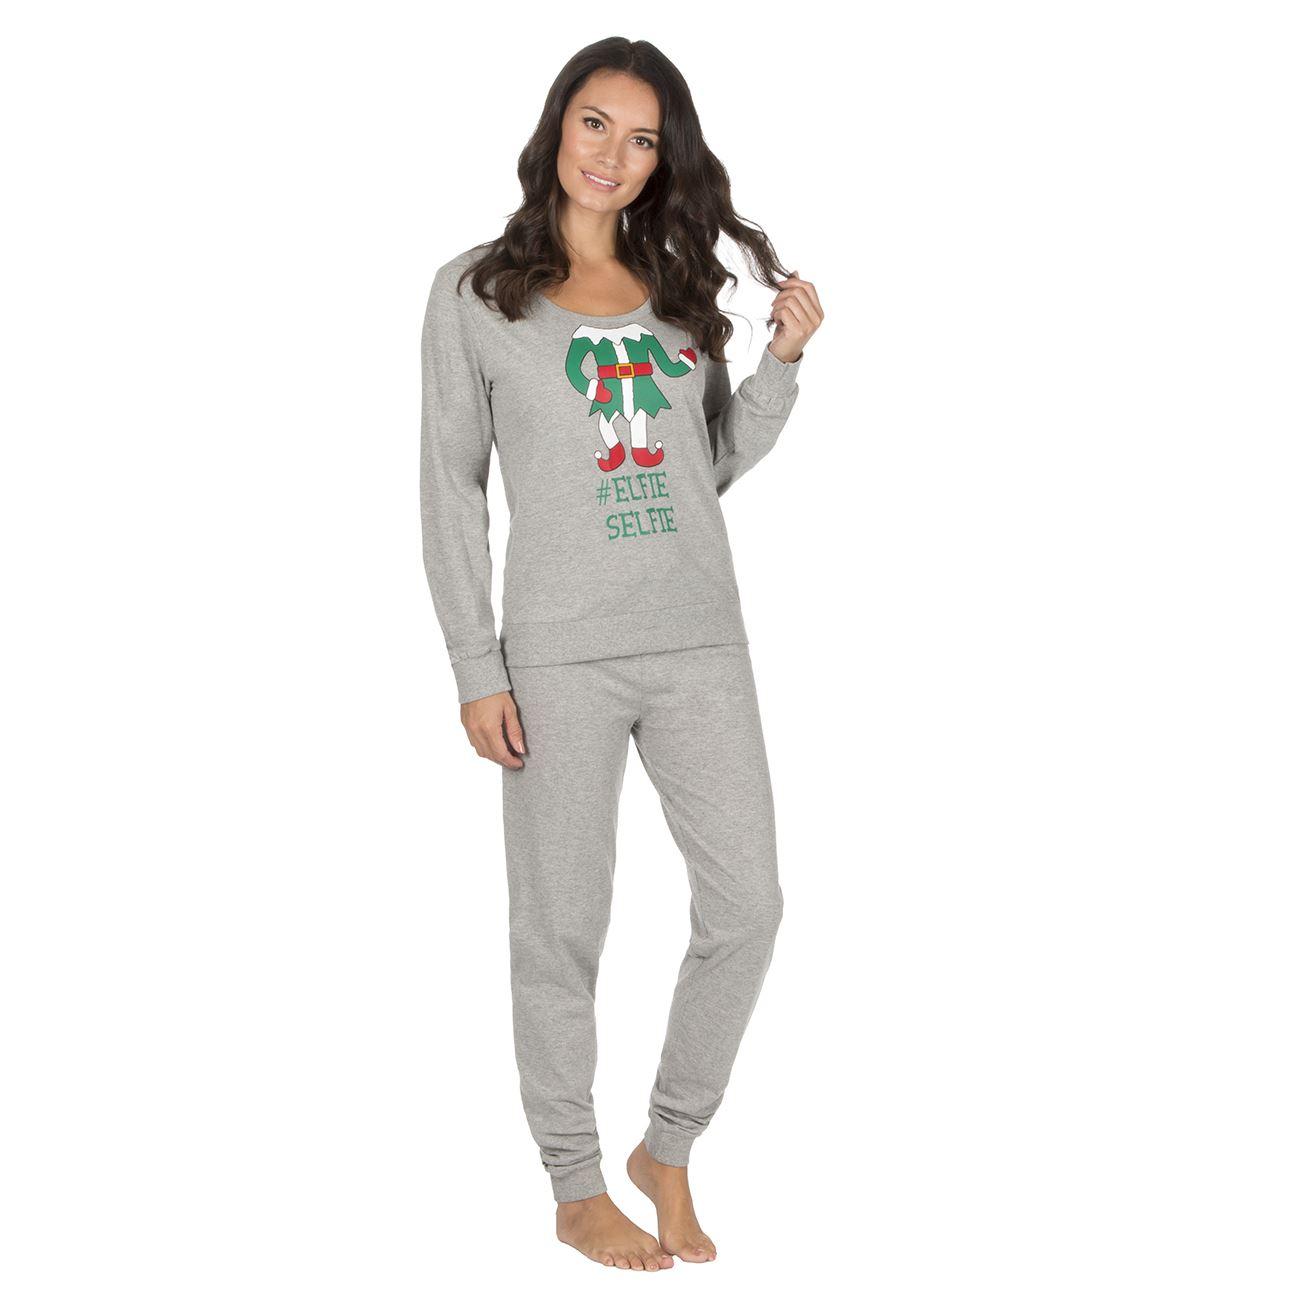 Set Pezzi Elfo Dettagli Elfie Pigiama Su Abbigliamento grigio Due Pigiama Donna BnHH6p1wqg